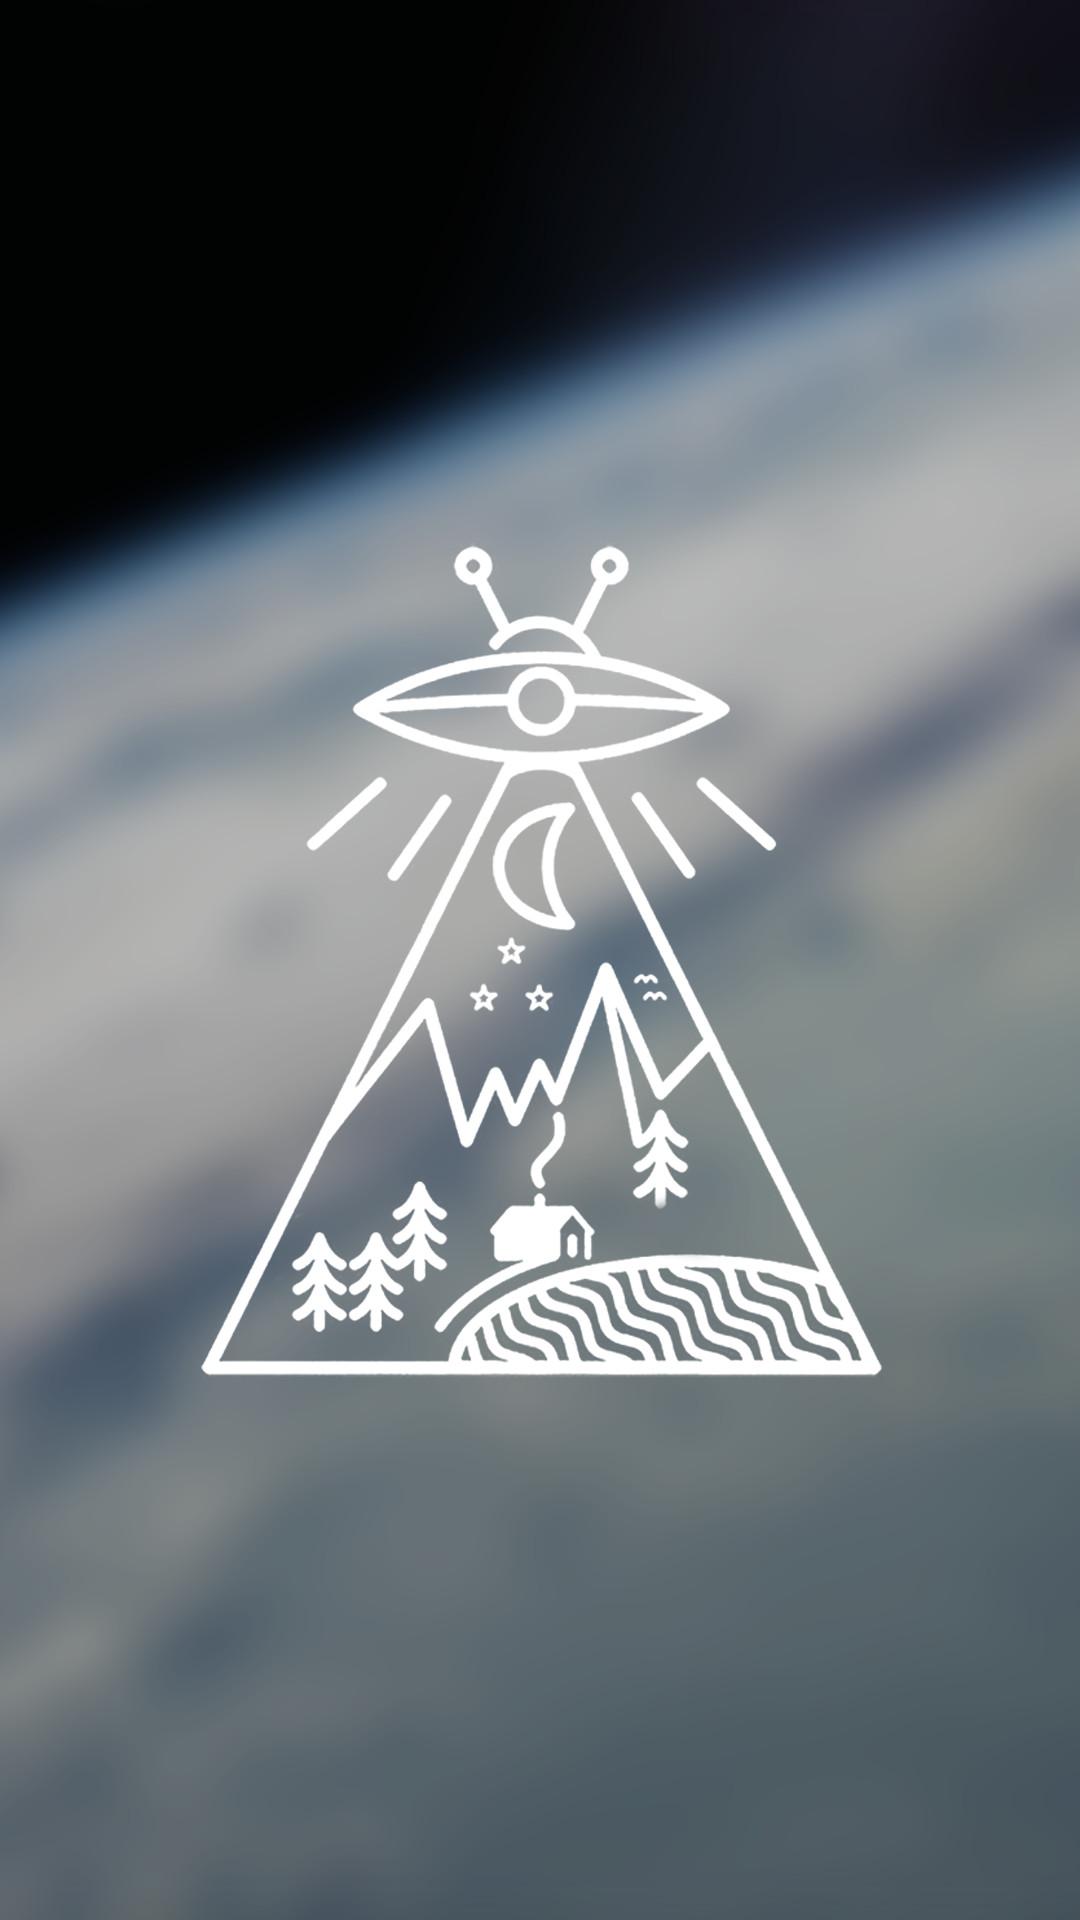 Best 51 UFO Files Wallpaper on HipWallpaper Moving UFO 1080x1920